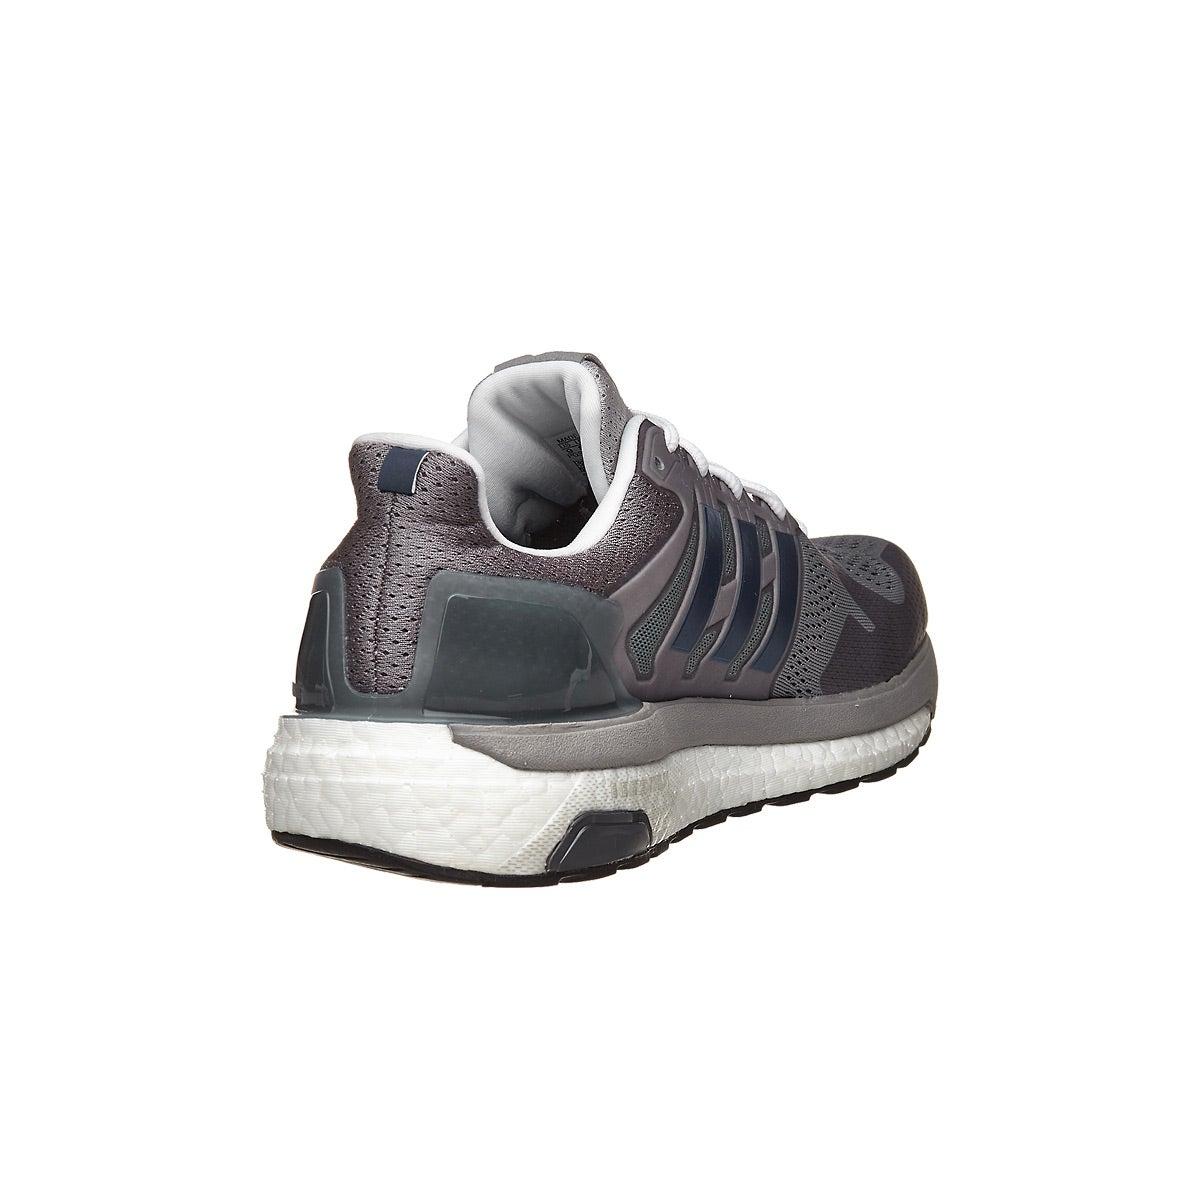 ba337ccd6cc25 adidas Supernova ST Aktiv Men s Shoes Grey Red 360° View